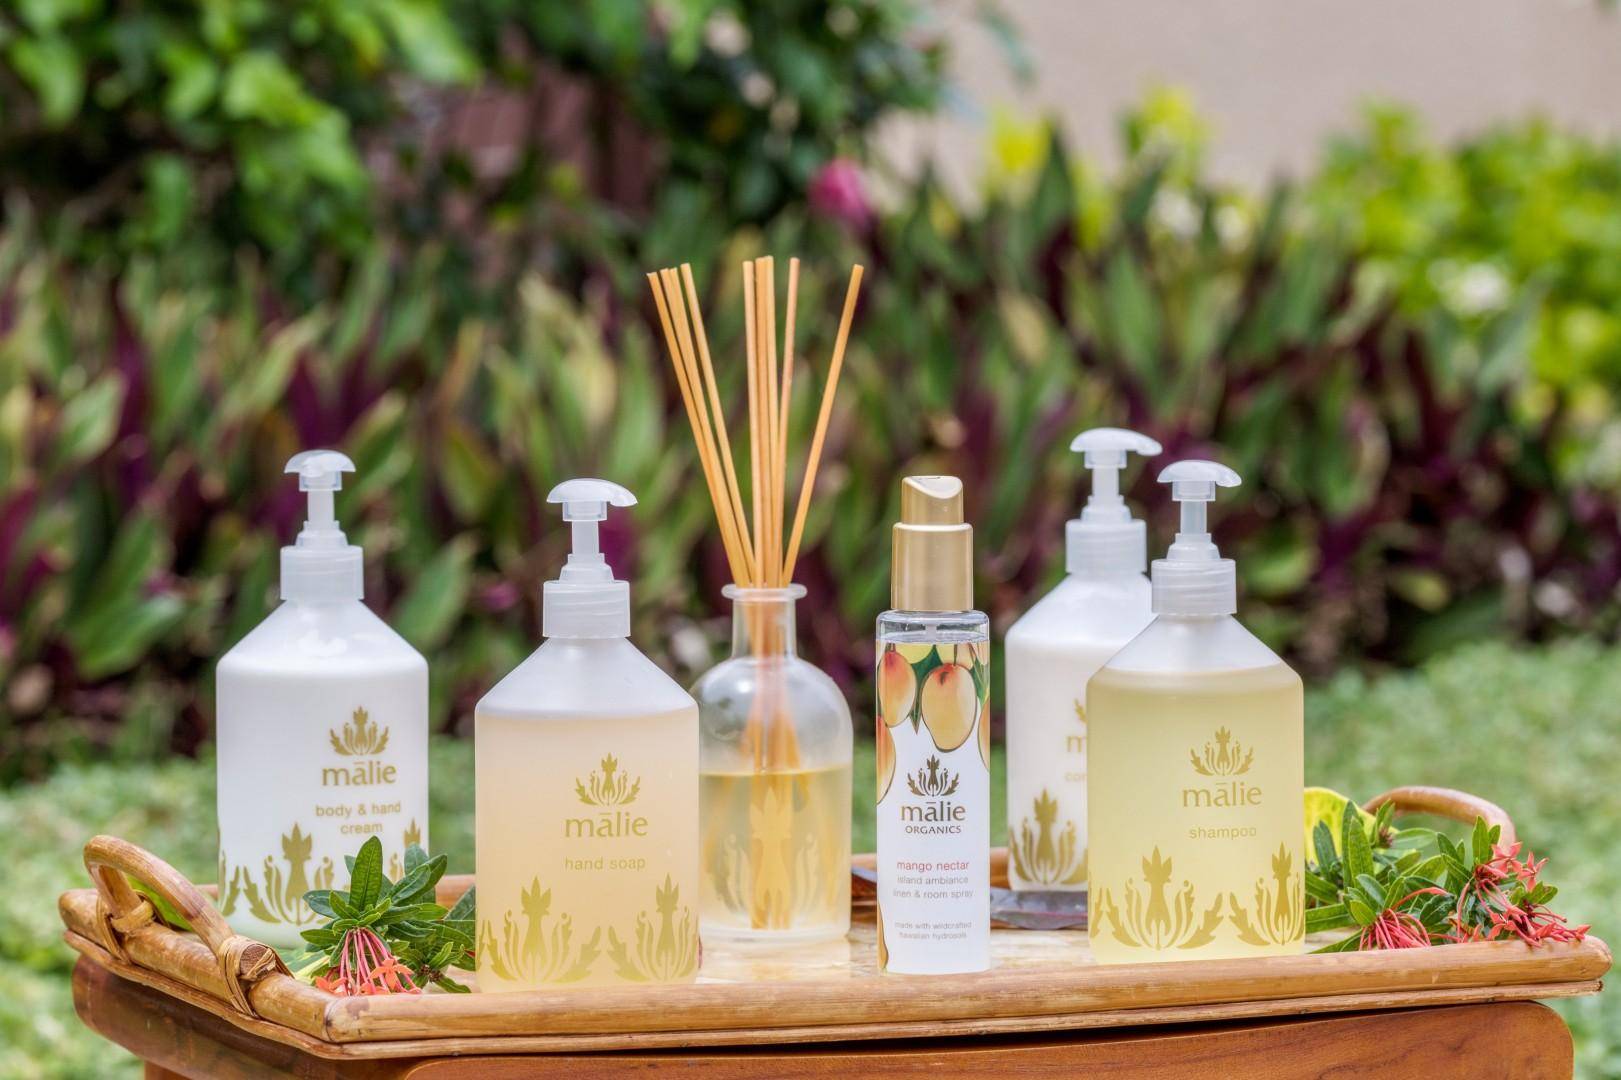 Luxurious Malie Organics toiletries supplied throughout house.